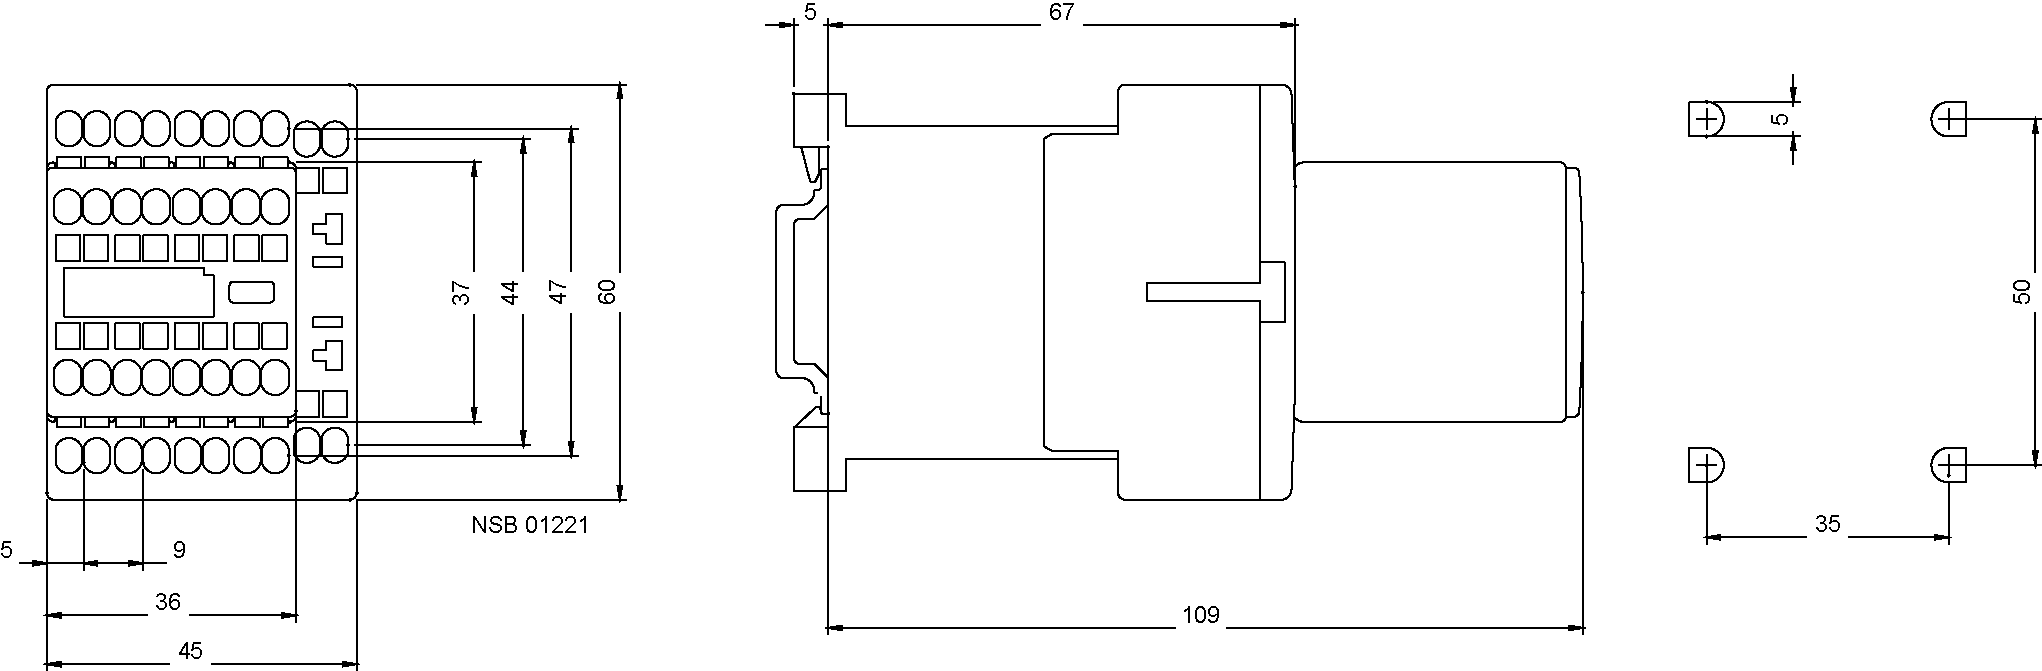 %D0%92%D0%A1%D0%9F%D0%9E%D0%9C%D0%9E%D0%93%D0%90%D0%A2%D0%95%D0%9B%D0%AC%D0%9D%D0%AB%D0%99%20%D0%9A%D0%9E%D0%9D%D0%A2%D0%90%D0%9A%D0%A2%D0%9E%D0%A0,%204%D0%9D%D0%9E+4%D0%9D%D0%97%20AC%20110%20V%2050/60%20%D0%93%D0%A6%20%D0%9F%D0%A0%D0%A3%D0%96%D0%98%D0%9D%D0%9D%D0%AB%D0%95%20%D0%9A%D0%9B%D0%95%D0%9C%D0%9C%D0%AB%20(CAGE%20CLAMP),%20%D0%A2%D0%98%D0%9F%D0%9E%D0%A0%D0%90%D0%97%D0%9C%D0%95%D0%A0%20S00%20(3RH1344-2AF00)%203RH1344-2AF00%20Siemens